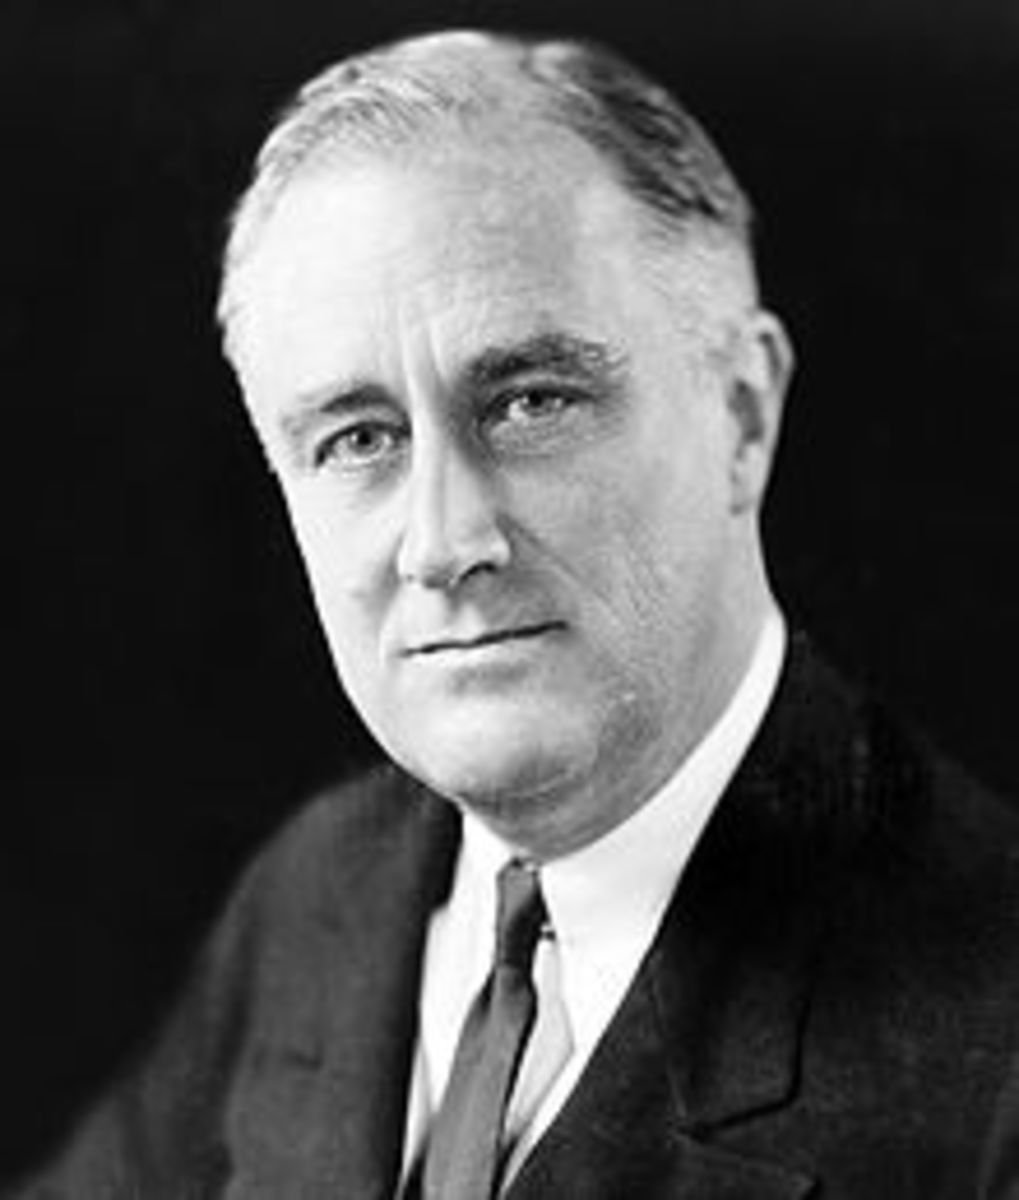 PRESIDENT FRANKLIN D. ROOSEVELT March 4, 1933 – April 12, 1945 FISCAL CONSERVATIVE, SOCIAL LIBERAL